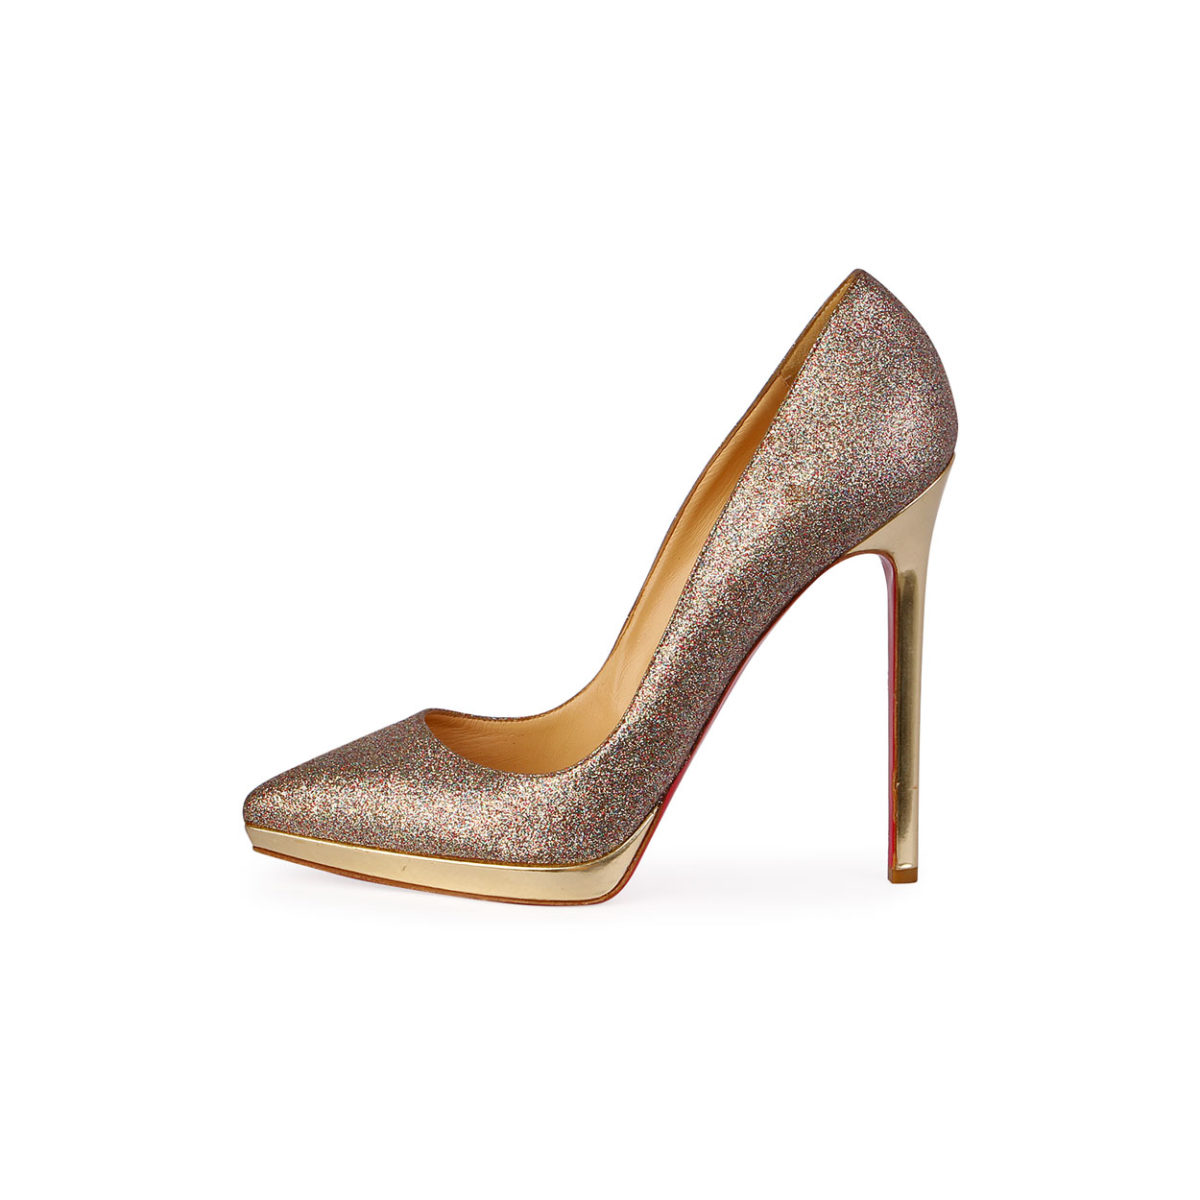 huge discount 6eef0 5e0e3 CHRISTIAN LOUBOUTIN Pigalle Plato Glitter Stiletto Pump Gold - S: 40 (7)